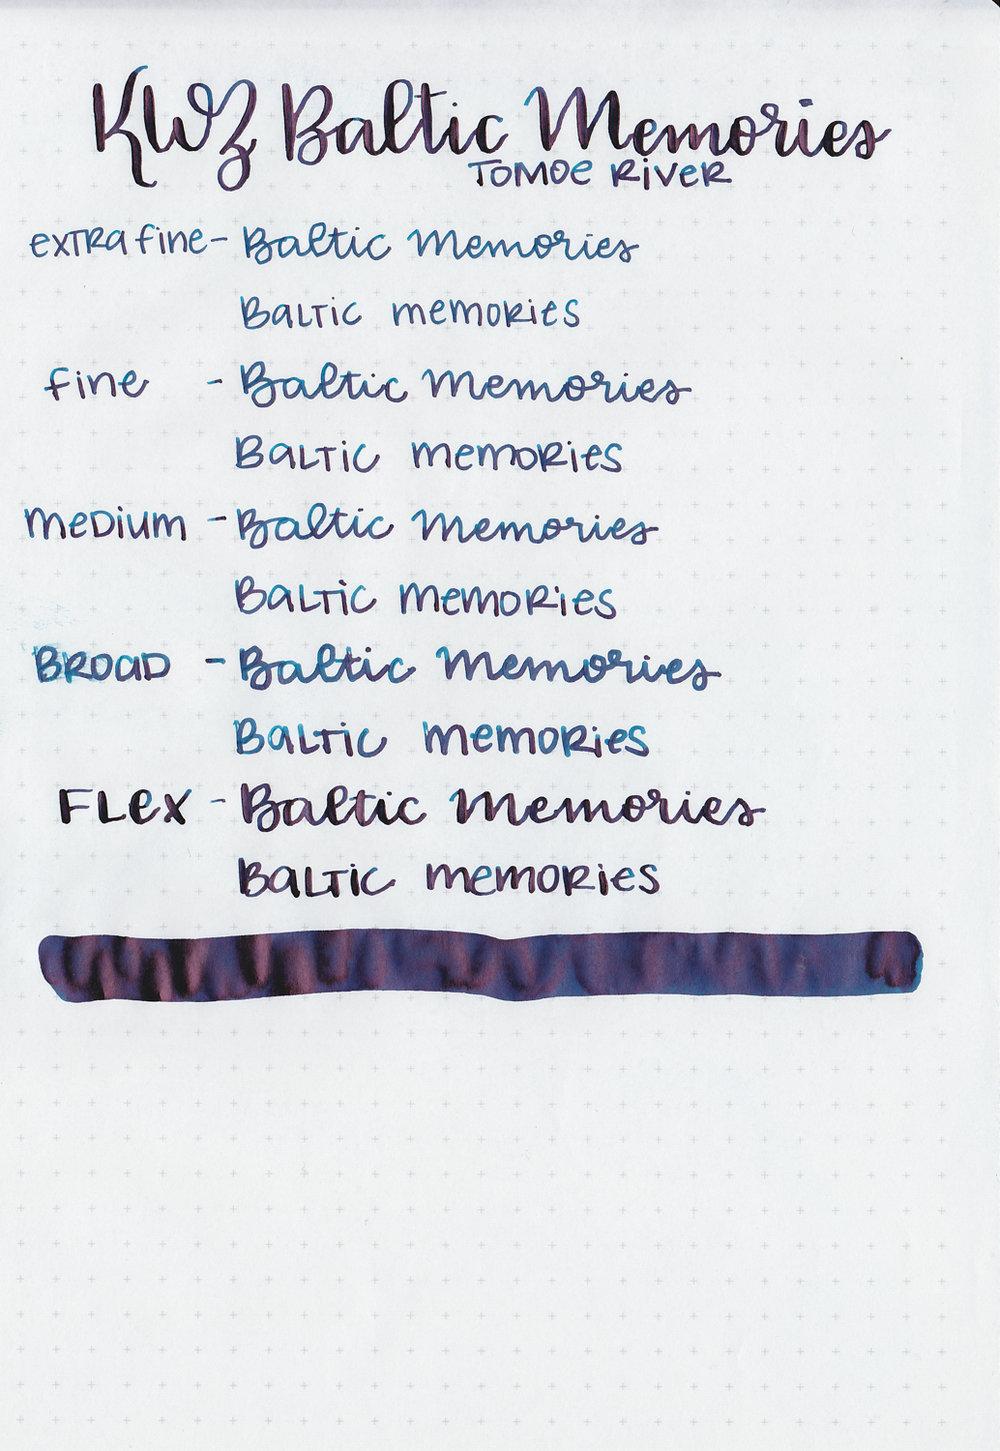 kwz-baltic-memories-5.jpg